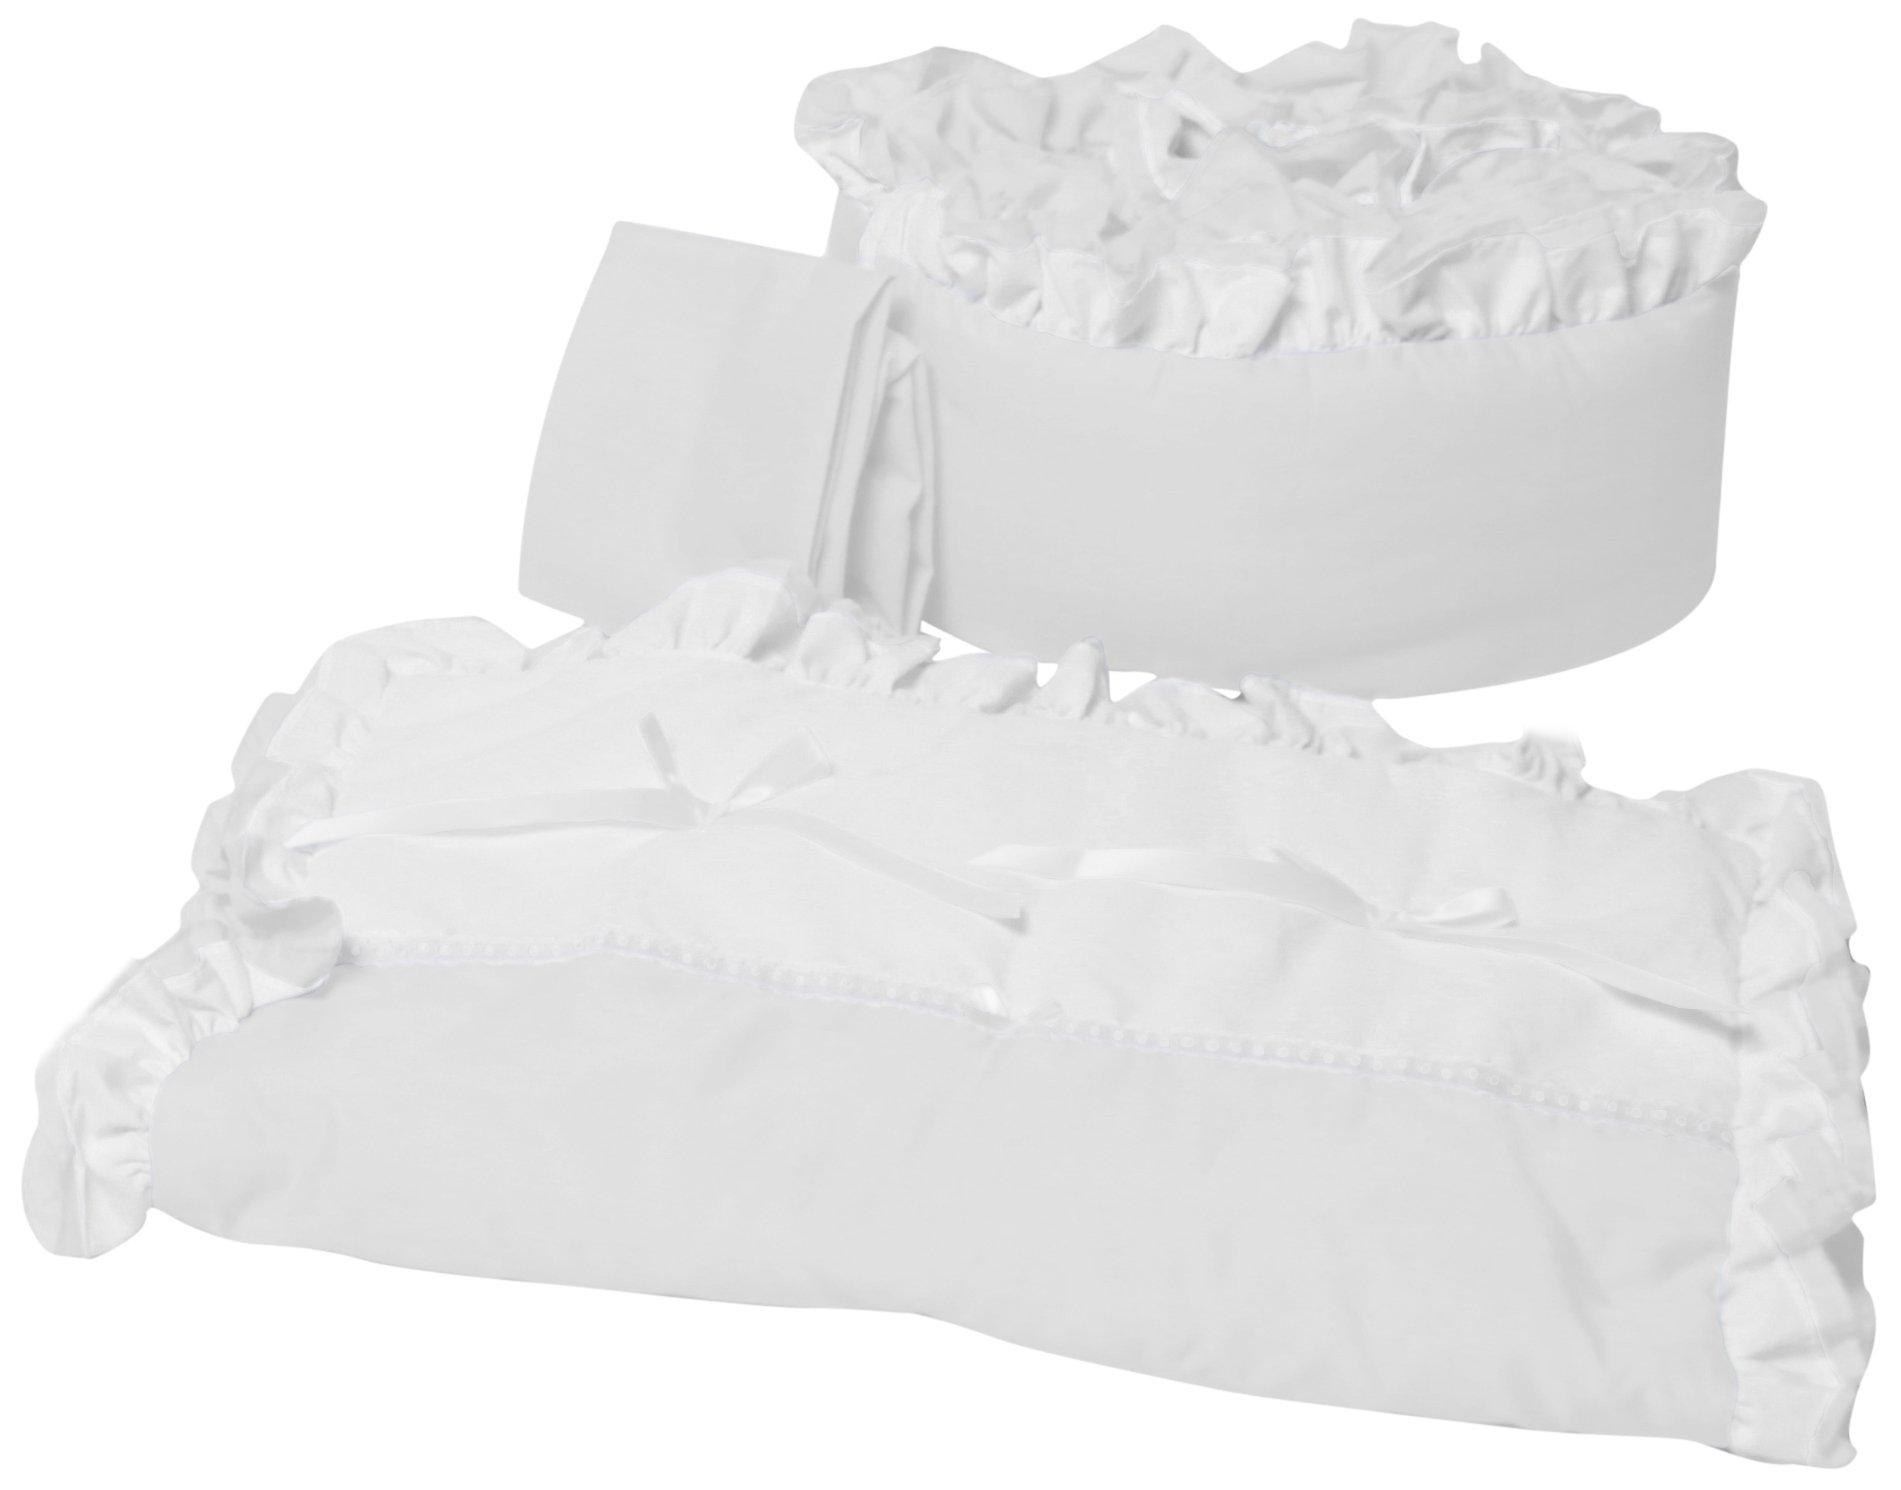 Baby Doll Bedding Regal Cradle Bedding Set, White by BabyDoll Bedding